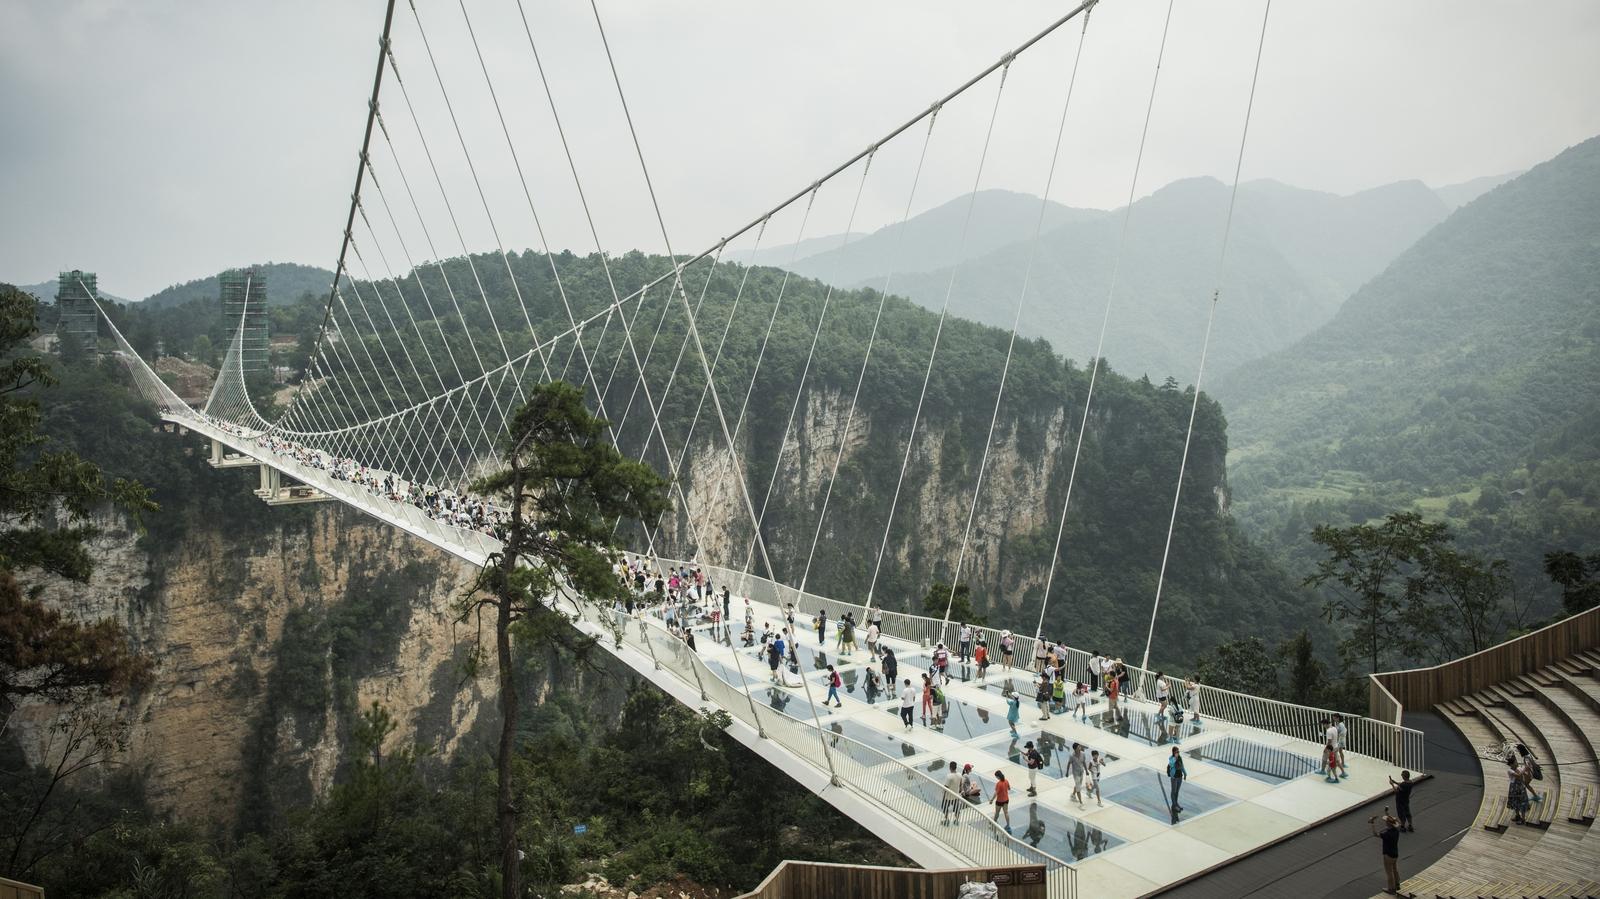 World's longest glass bridge closes in second week